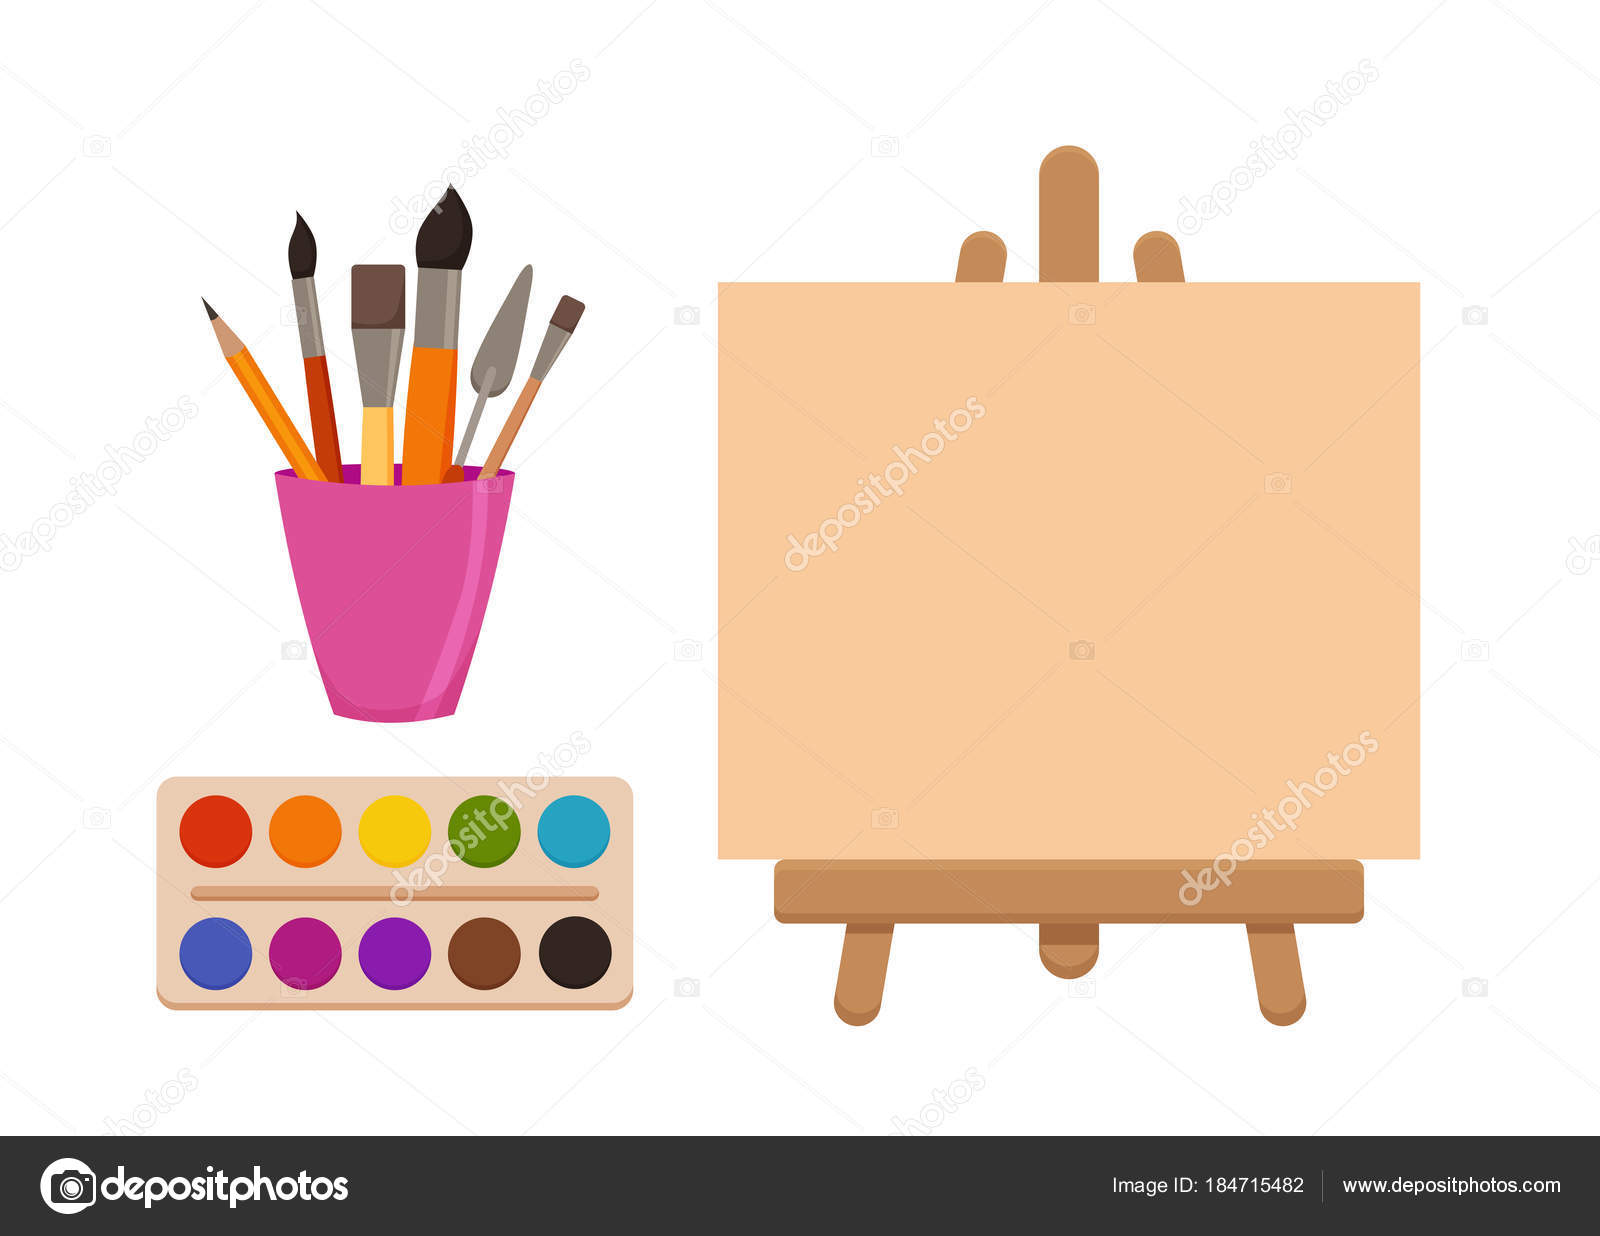 Elementos De Ferramentas De Pintura Dos Desenhos Animados